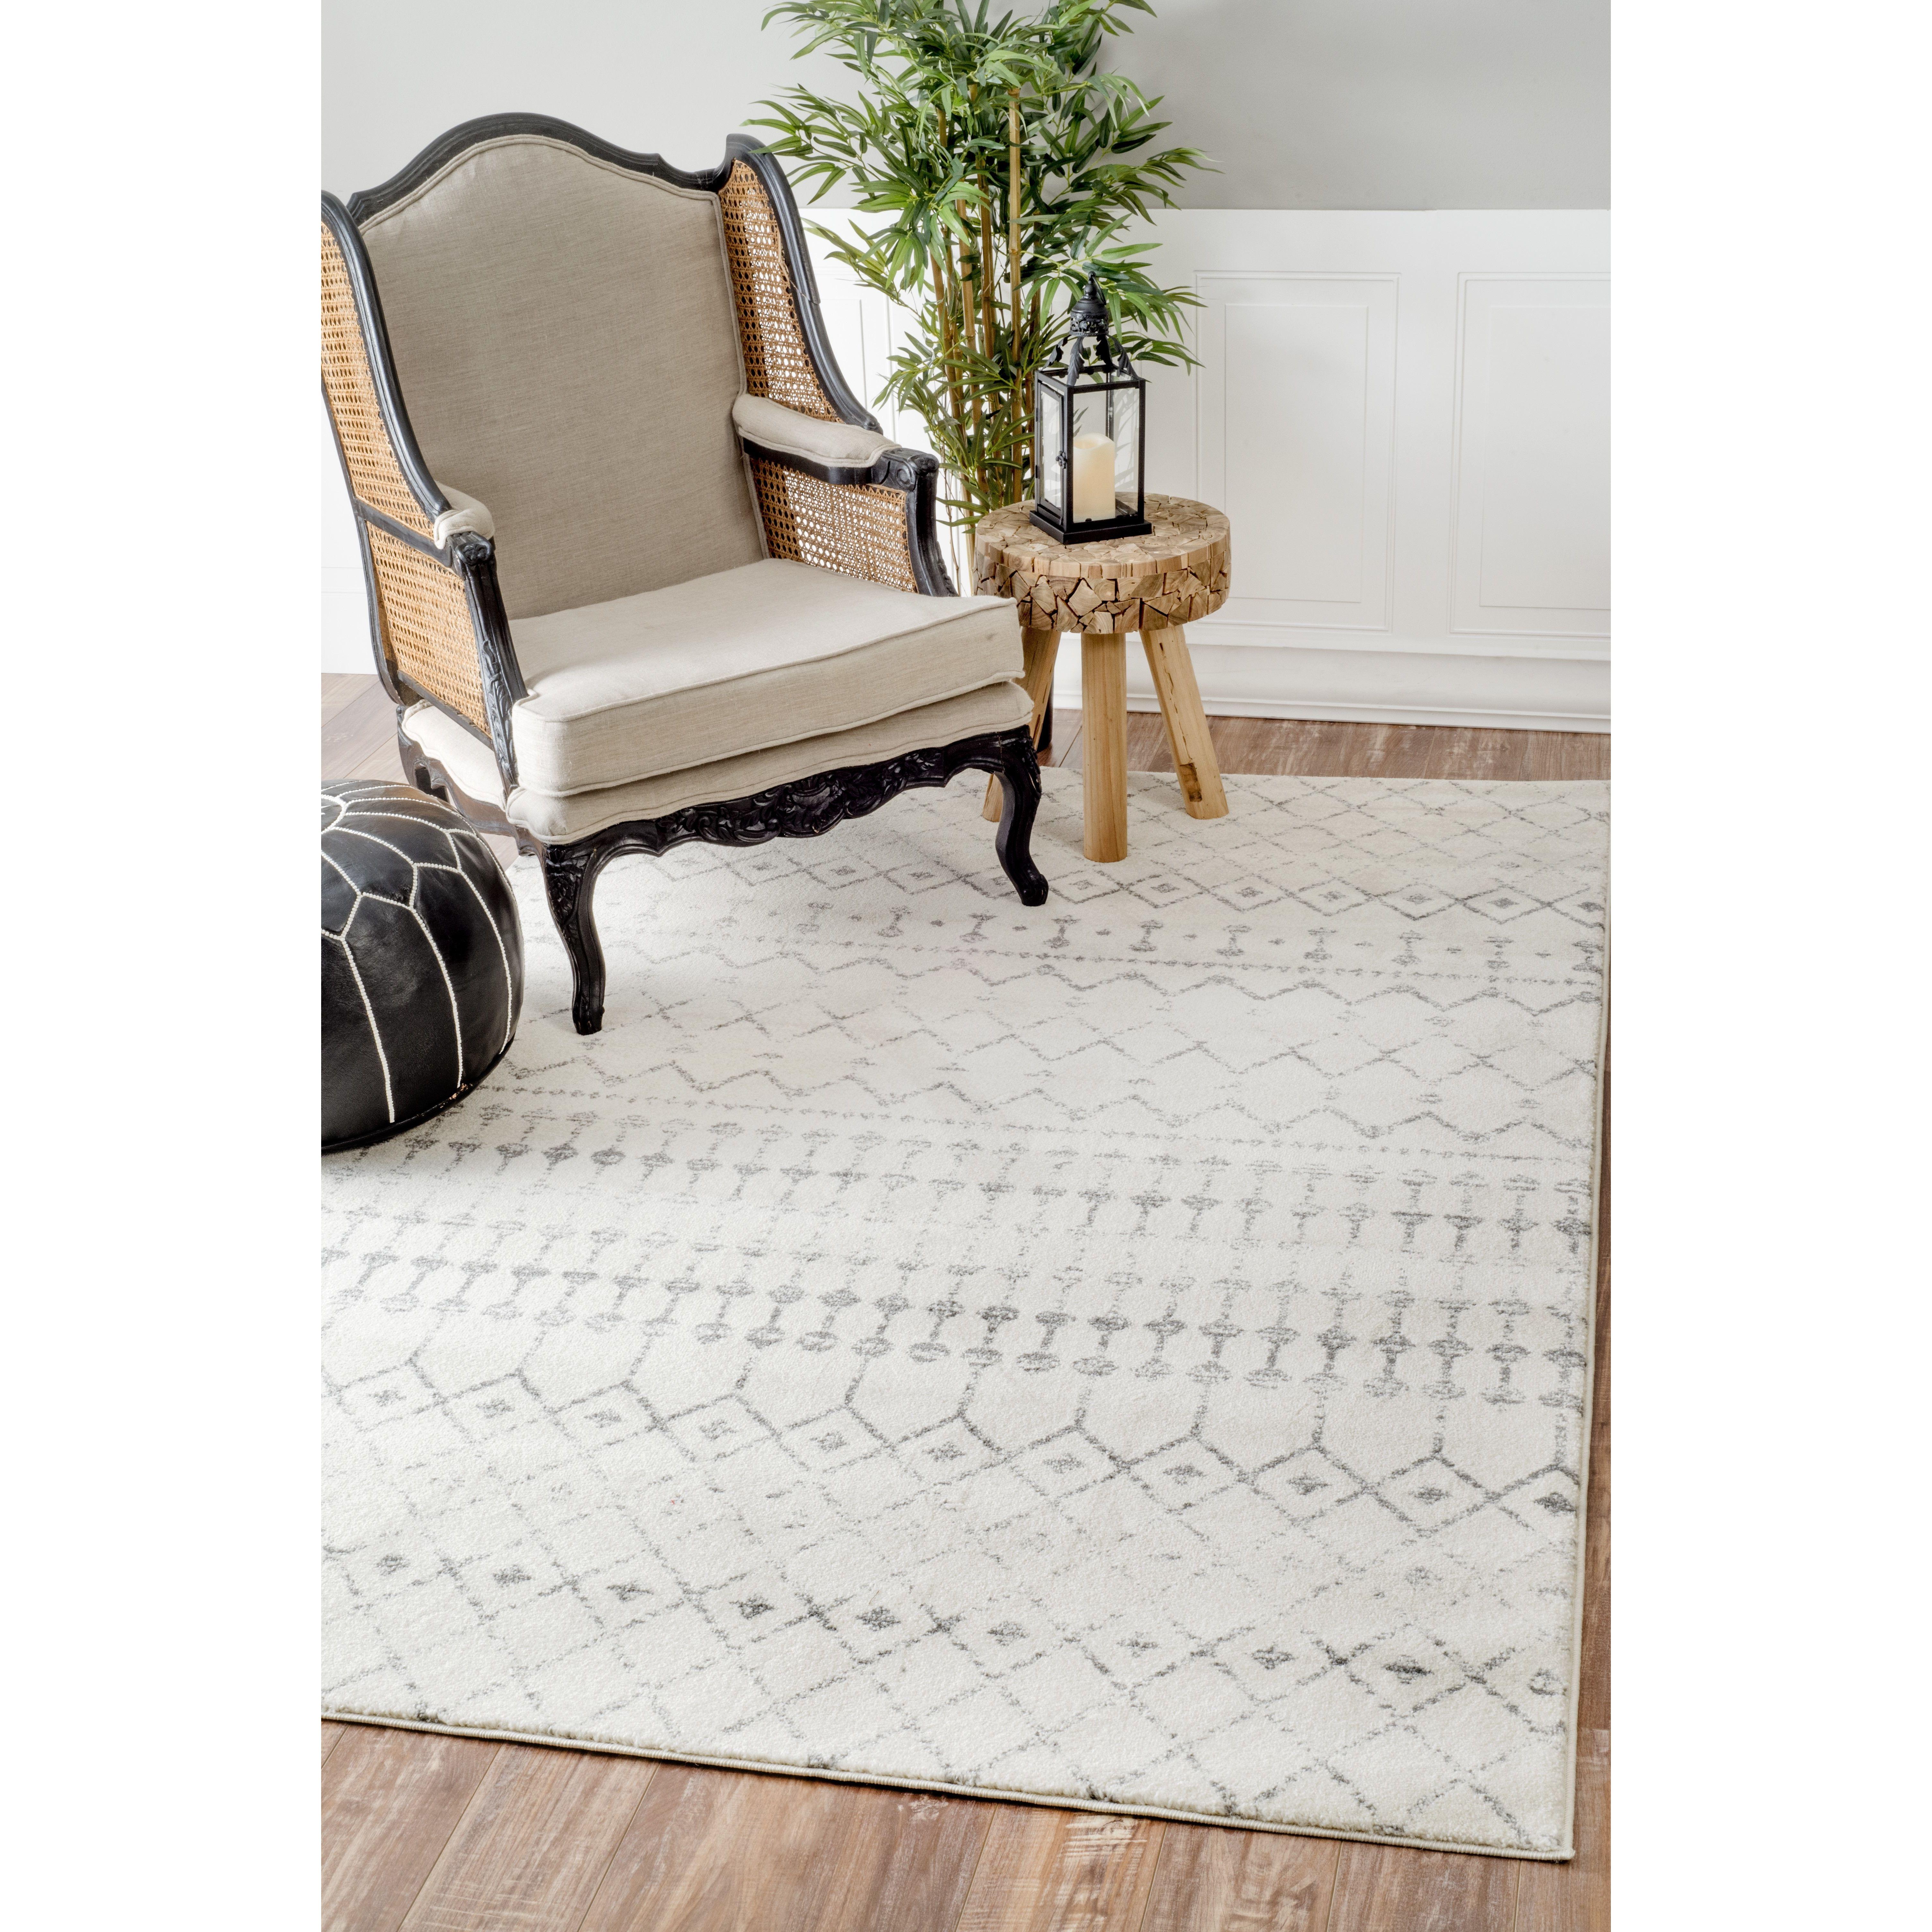 room size clearance faze ruta rugs of wayfair living stunning large target rug throw lappljung